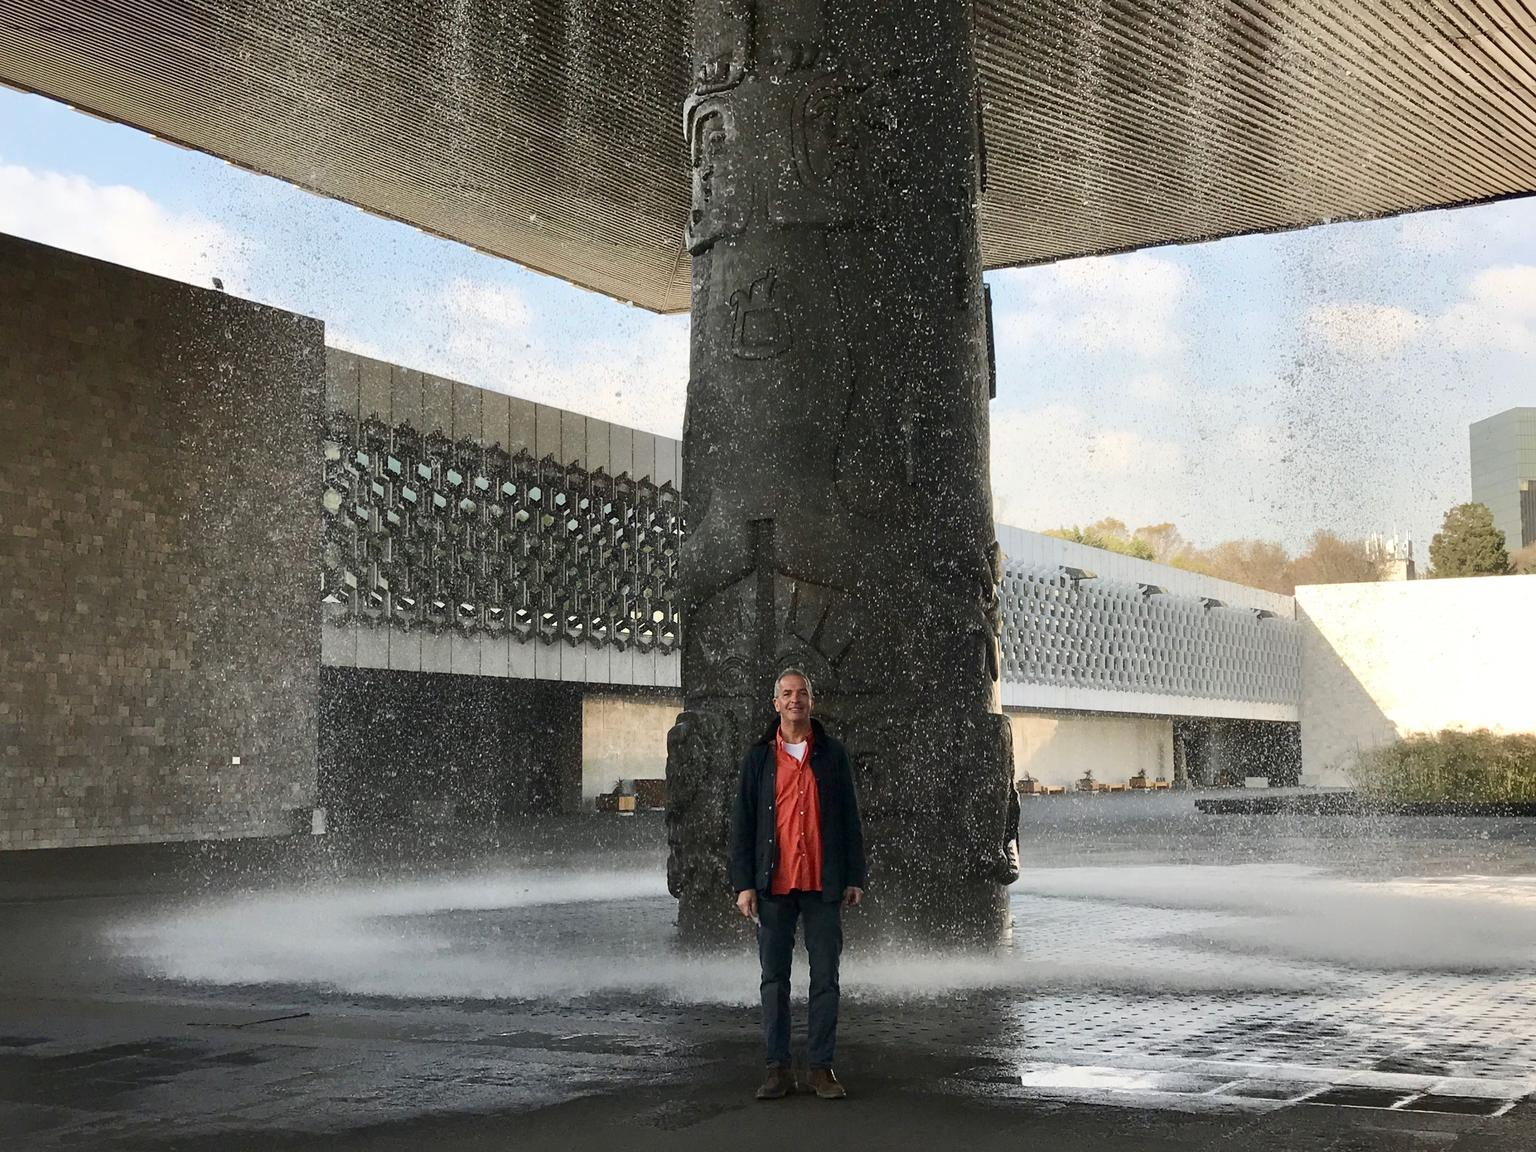 MAIS FOTOS, Museu Nacional de Antropologia na Cidade do México: entrada e guia